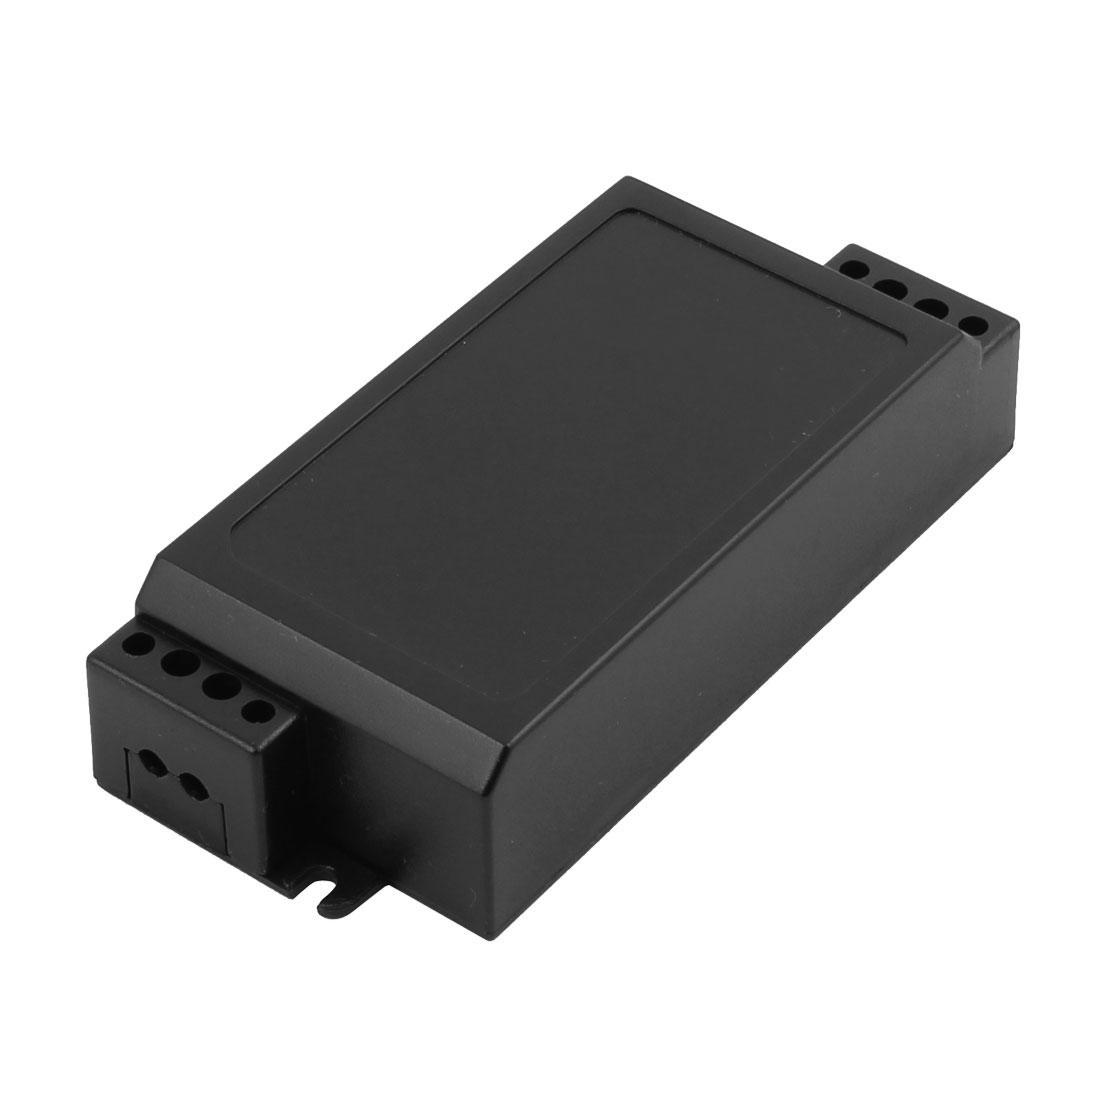 XL-147 94x43x23mm PC Flame Retardant Enclosure Junction Box for LED Driver Black